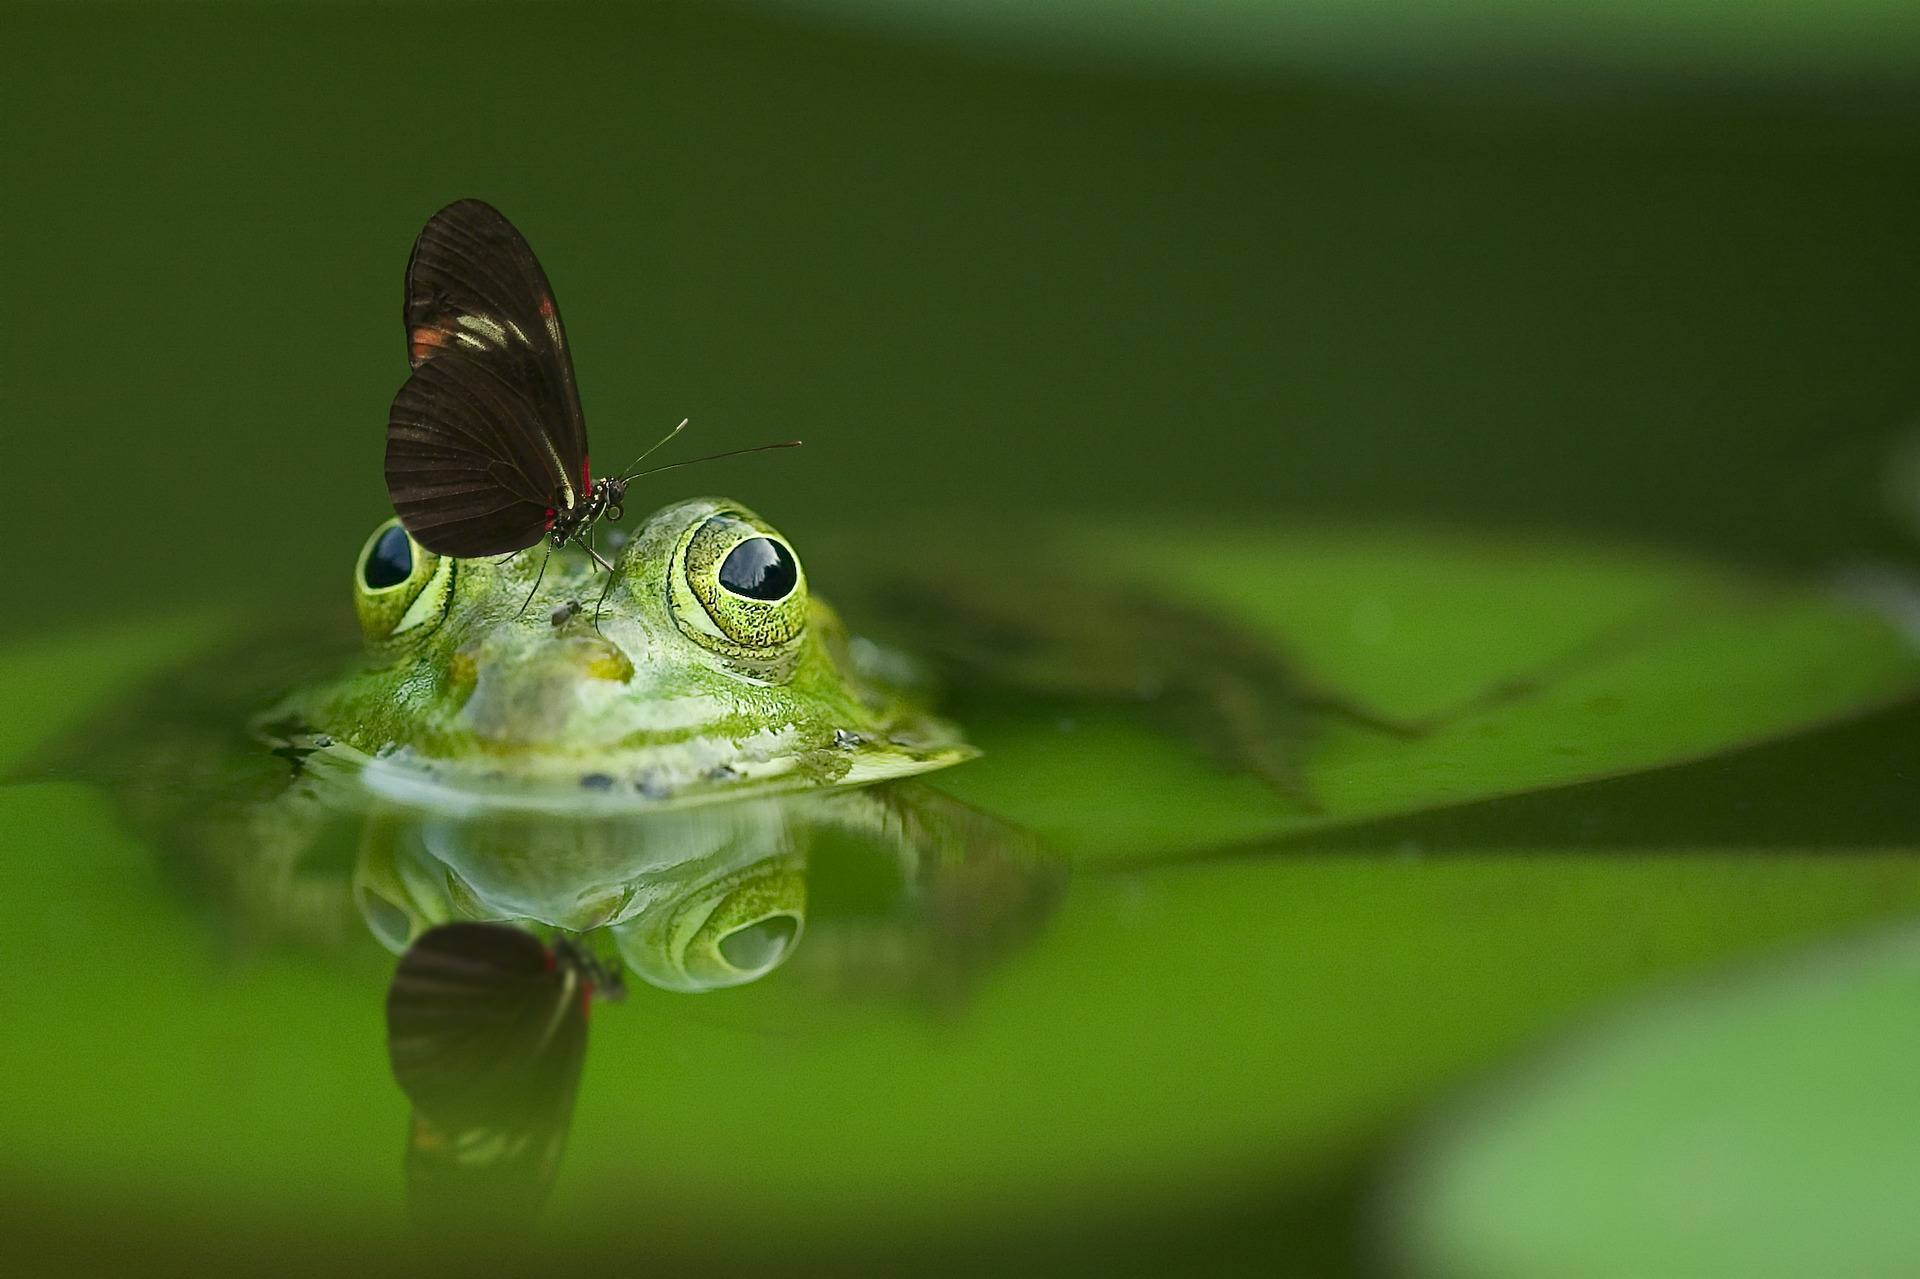 žaba, leptir i priroda